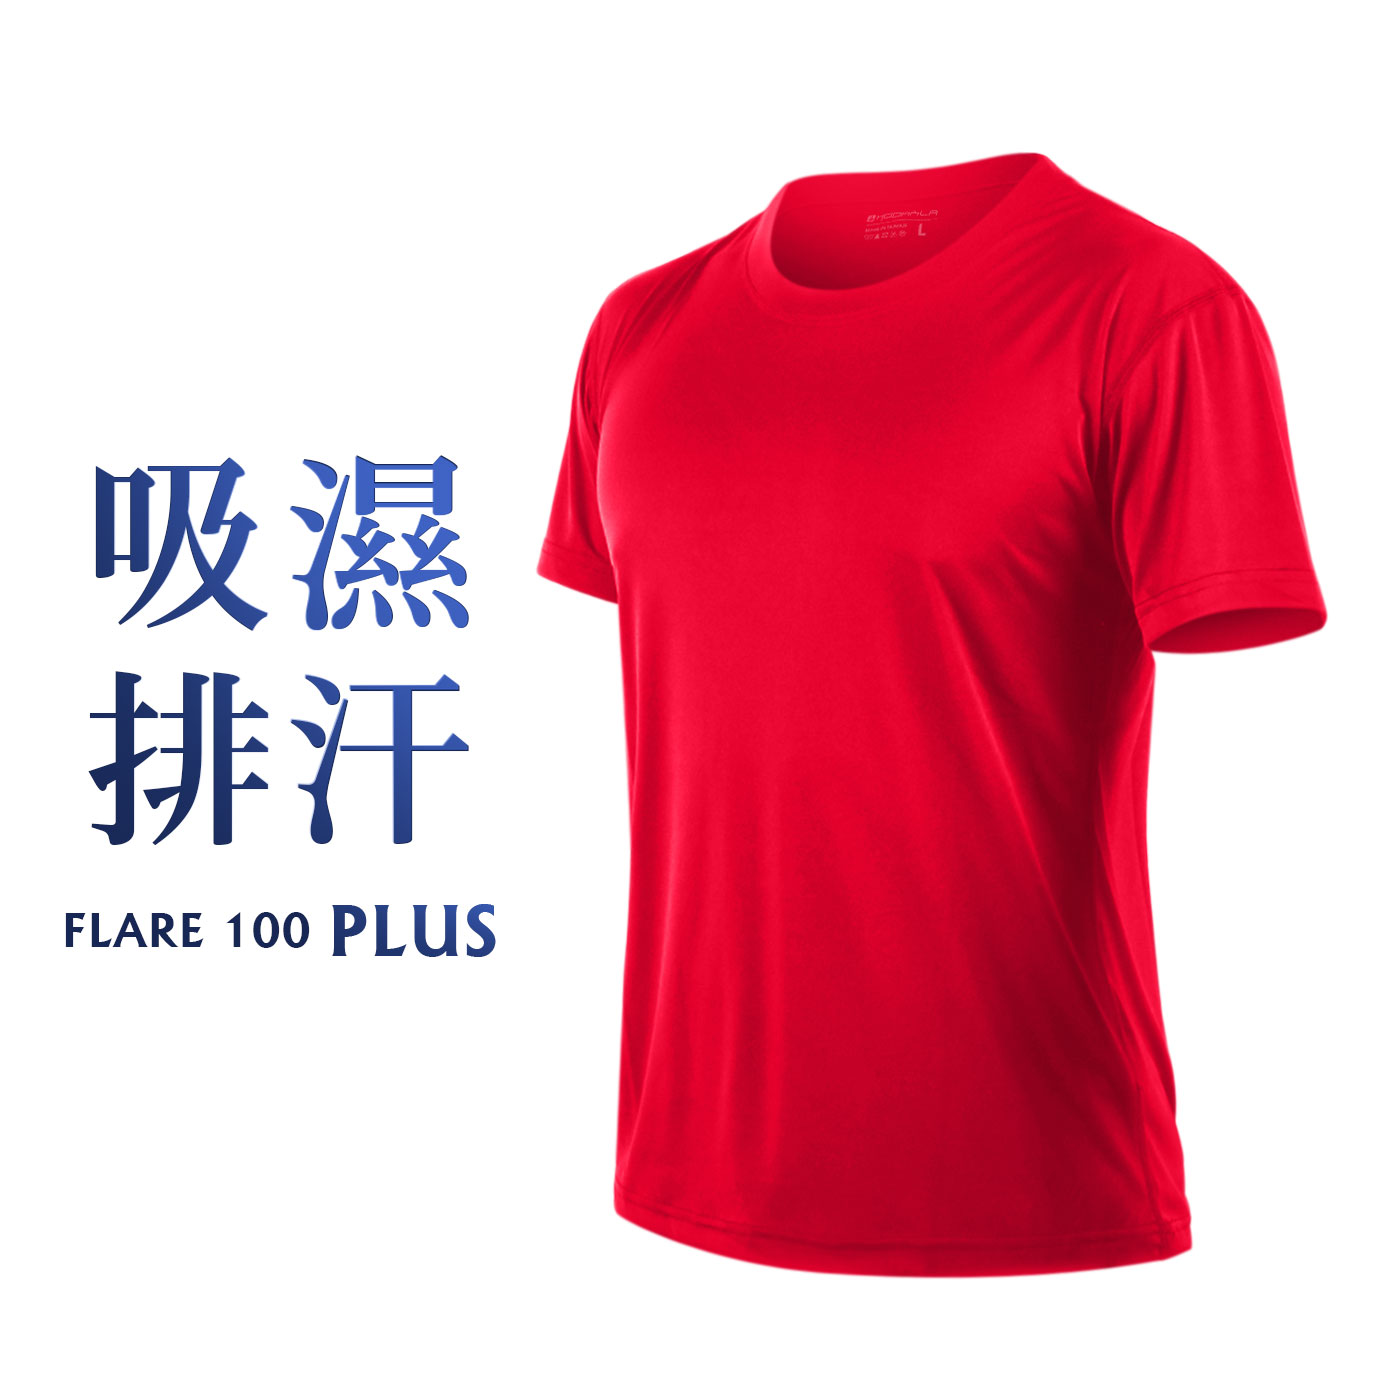 HODARLA FLARE 100 PLUS 吸濕排汗衫 3153701 - 紅